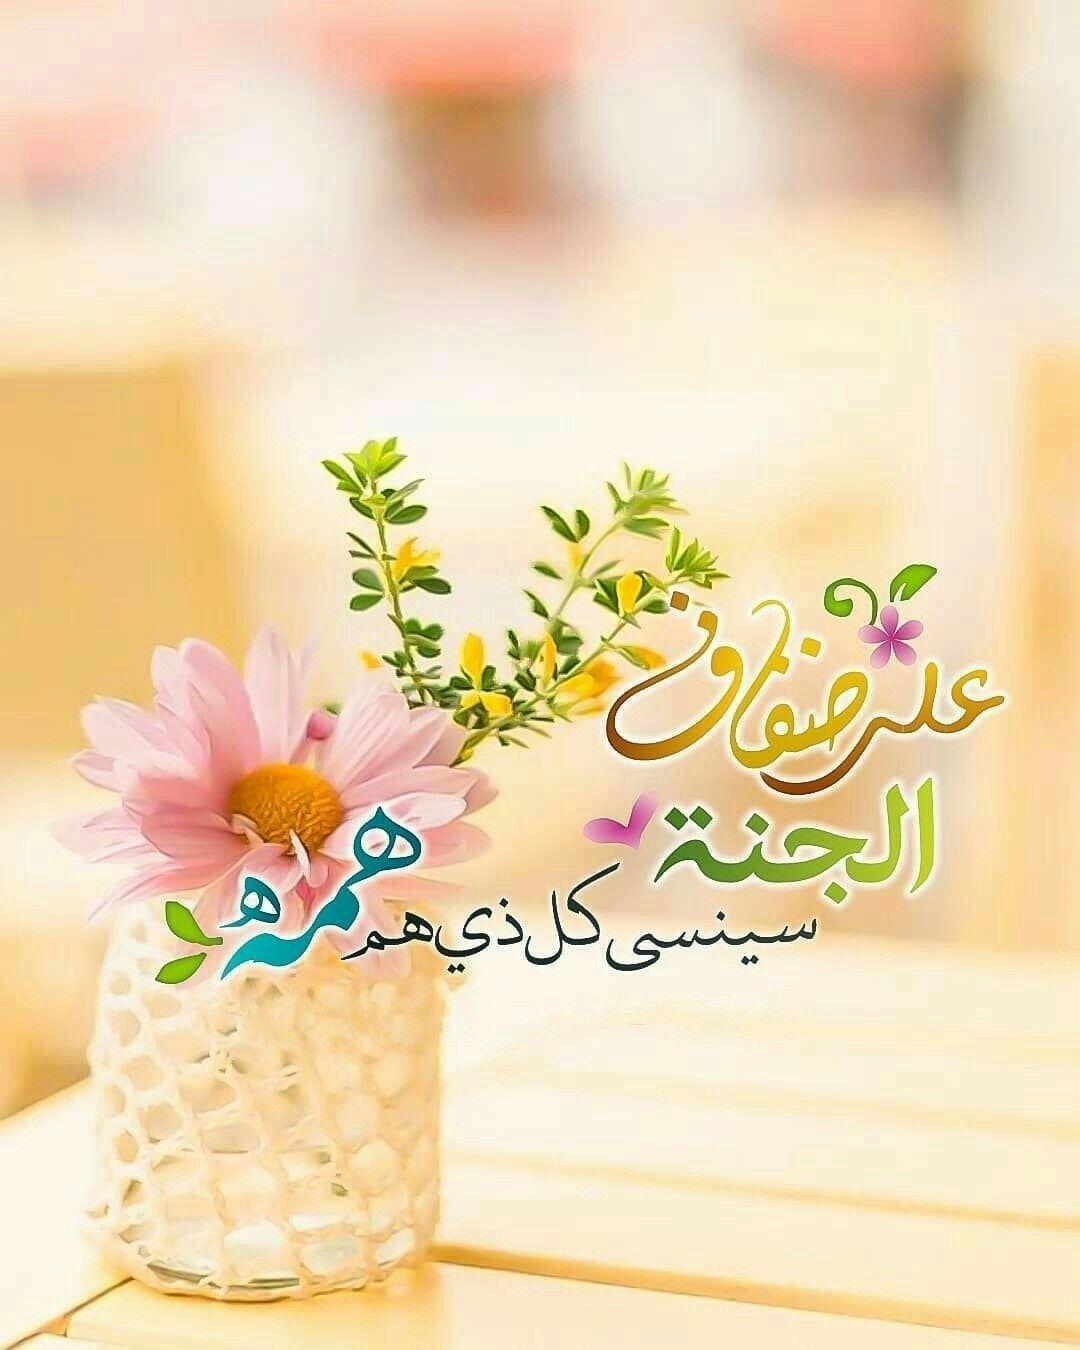 Pin By صورة و كلمة On مواعظ خواطر إسلامية I Love Heart Flower Photos Morning Images